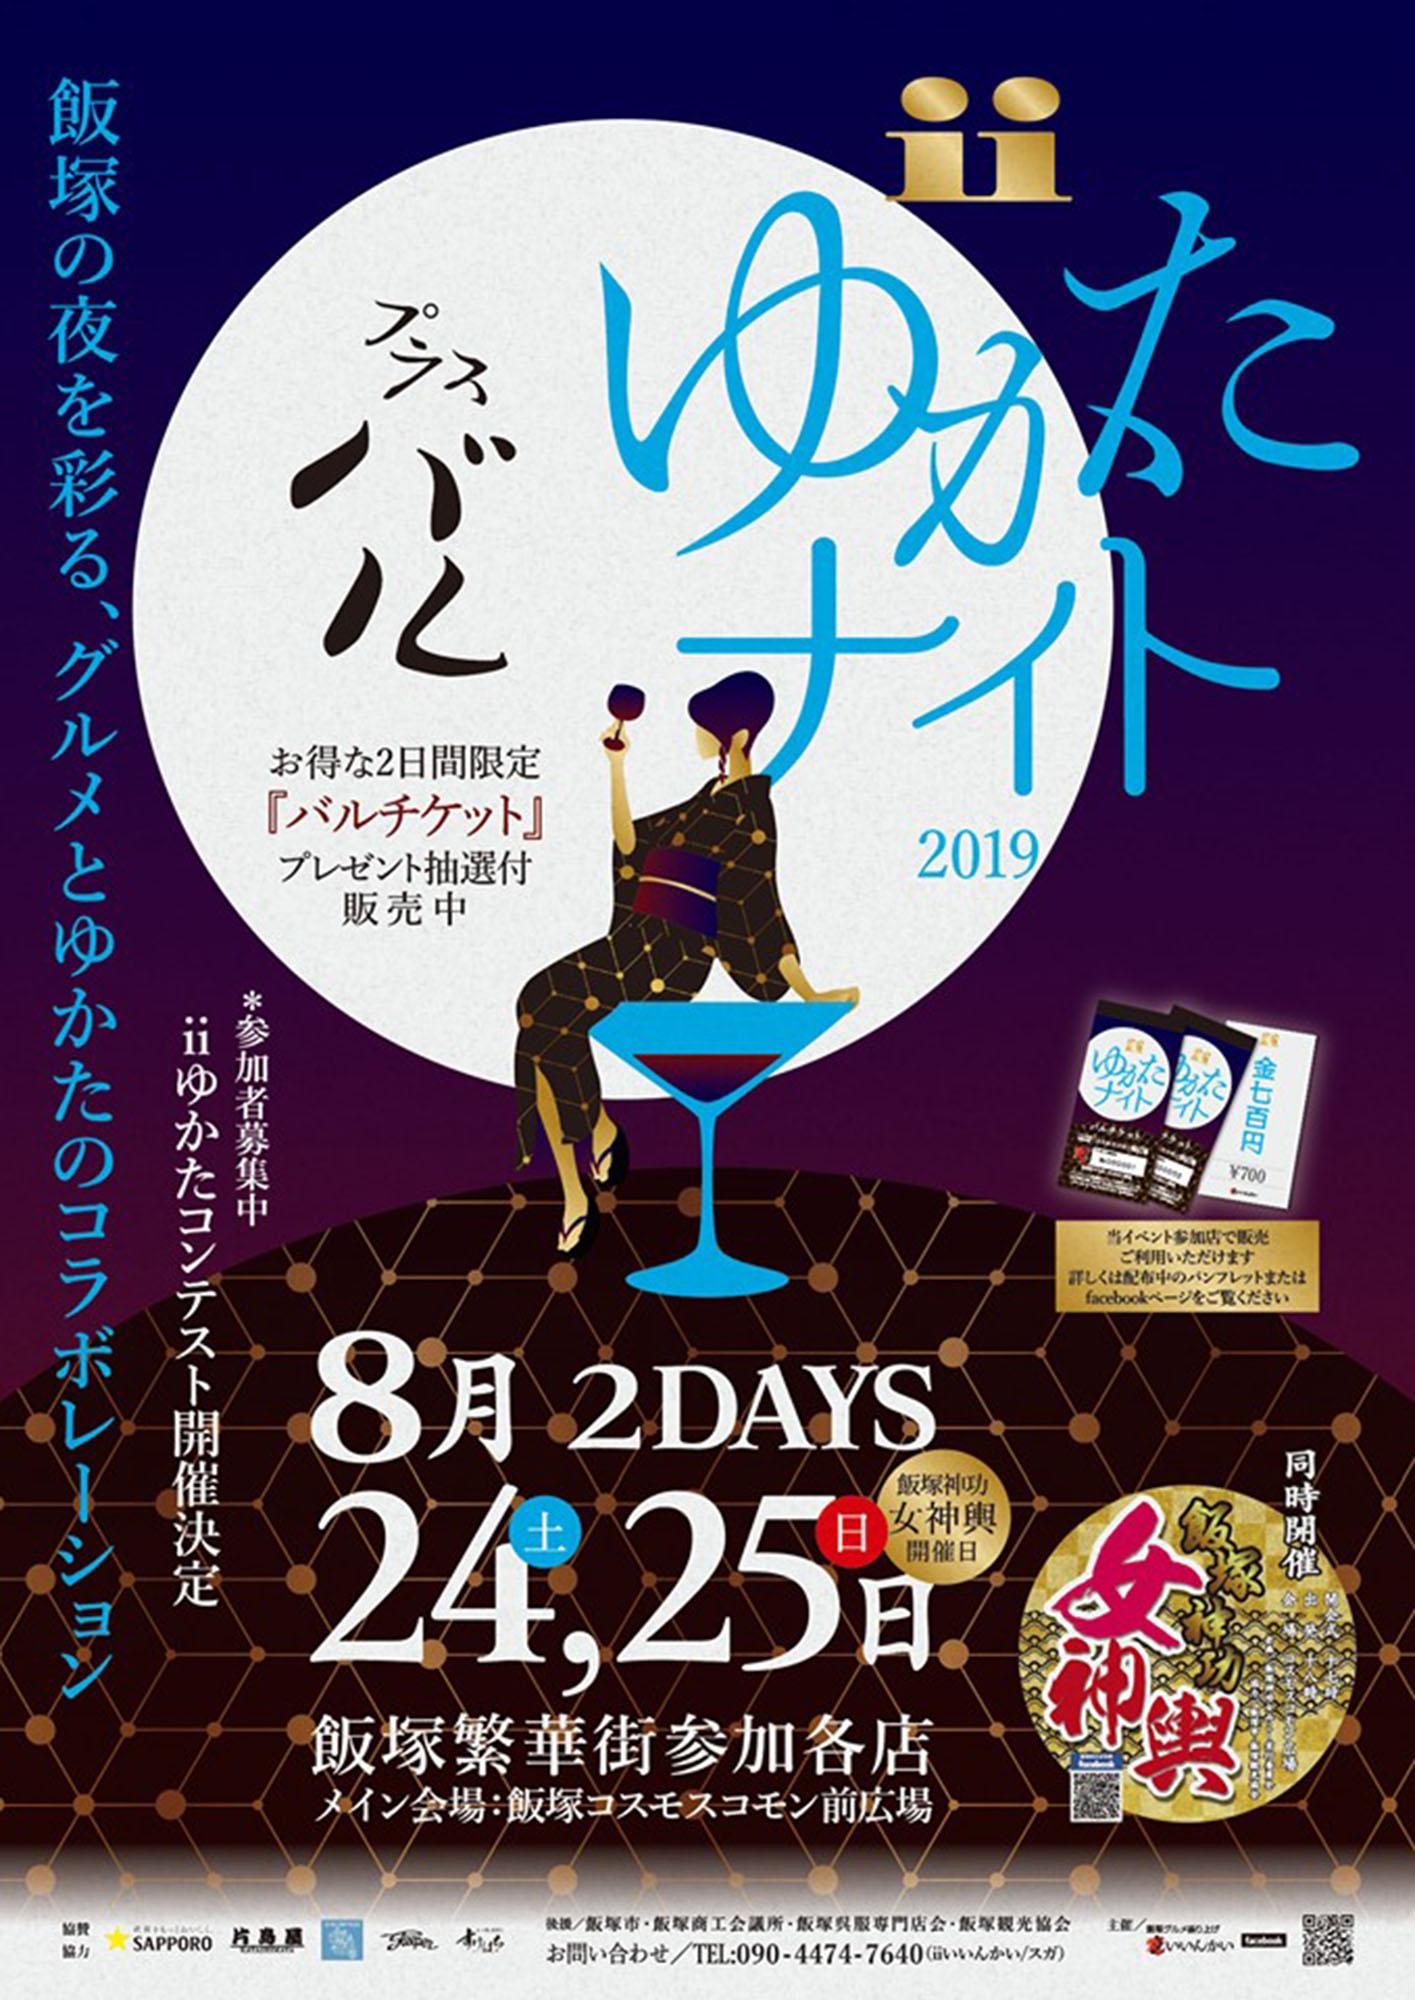 190824_iizuka_yukata_night